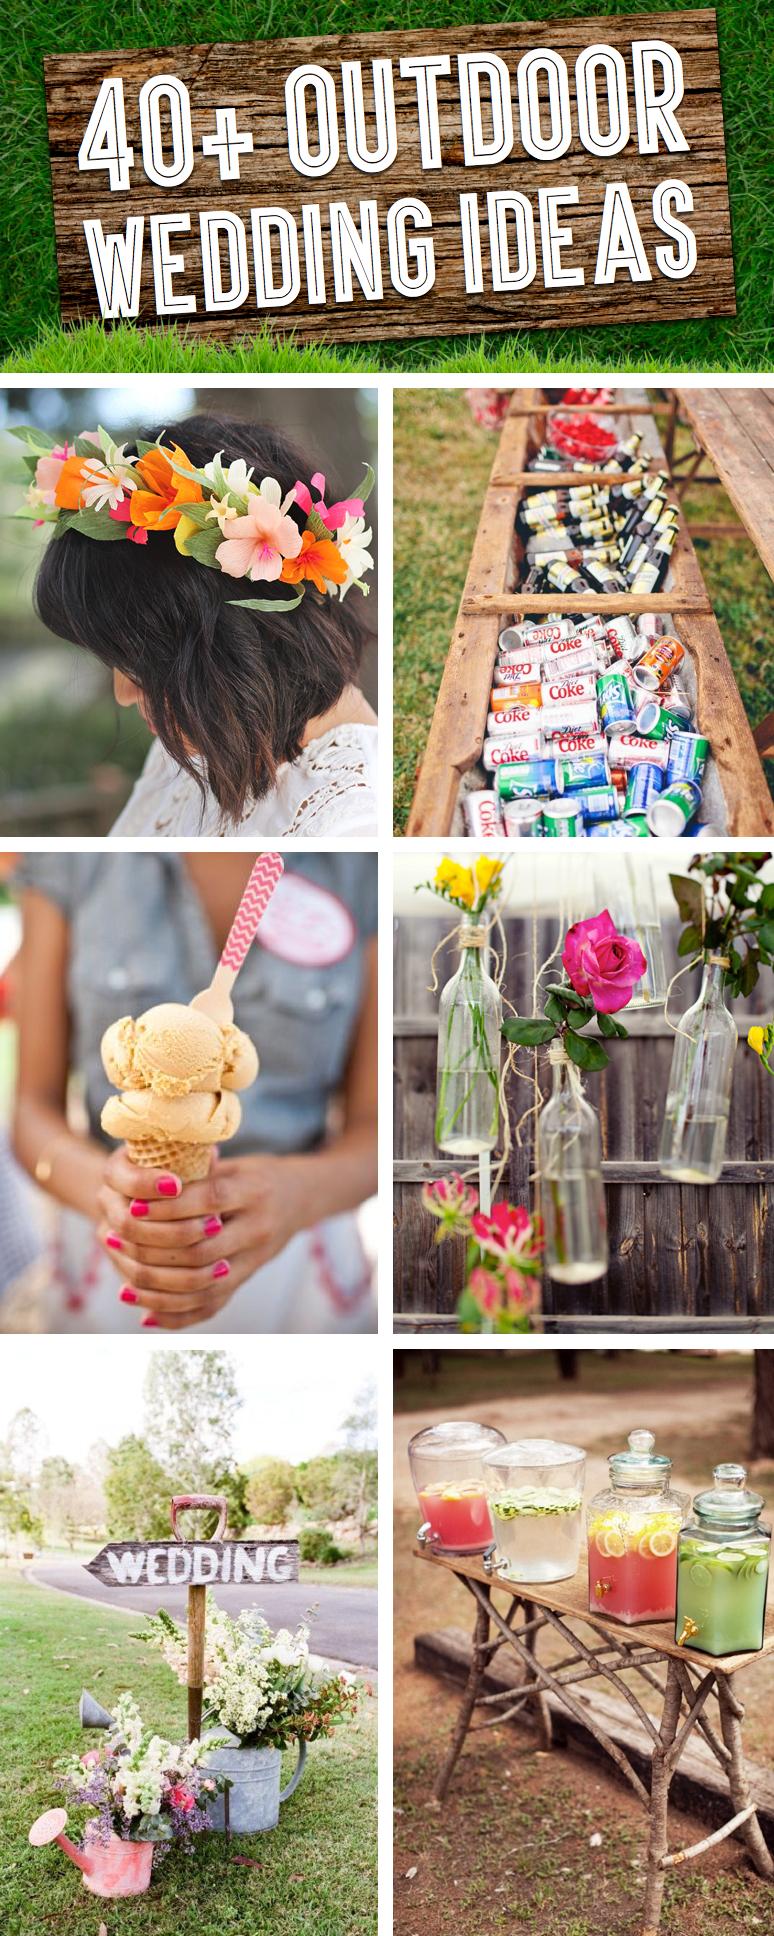 40 breathtaking diy vintage ideas for an outdoor wedding vintage wedding ideas 40 Breathtaking DIY Vintage Ideas For An Outdoor Wedding